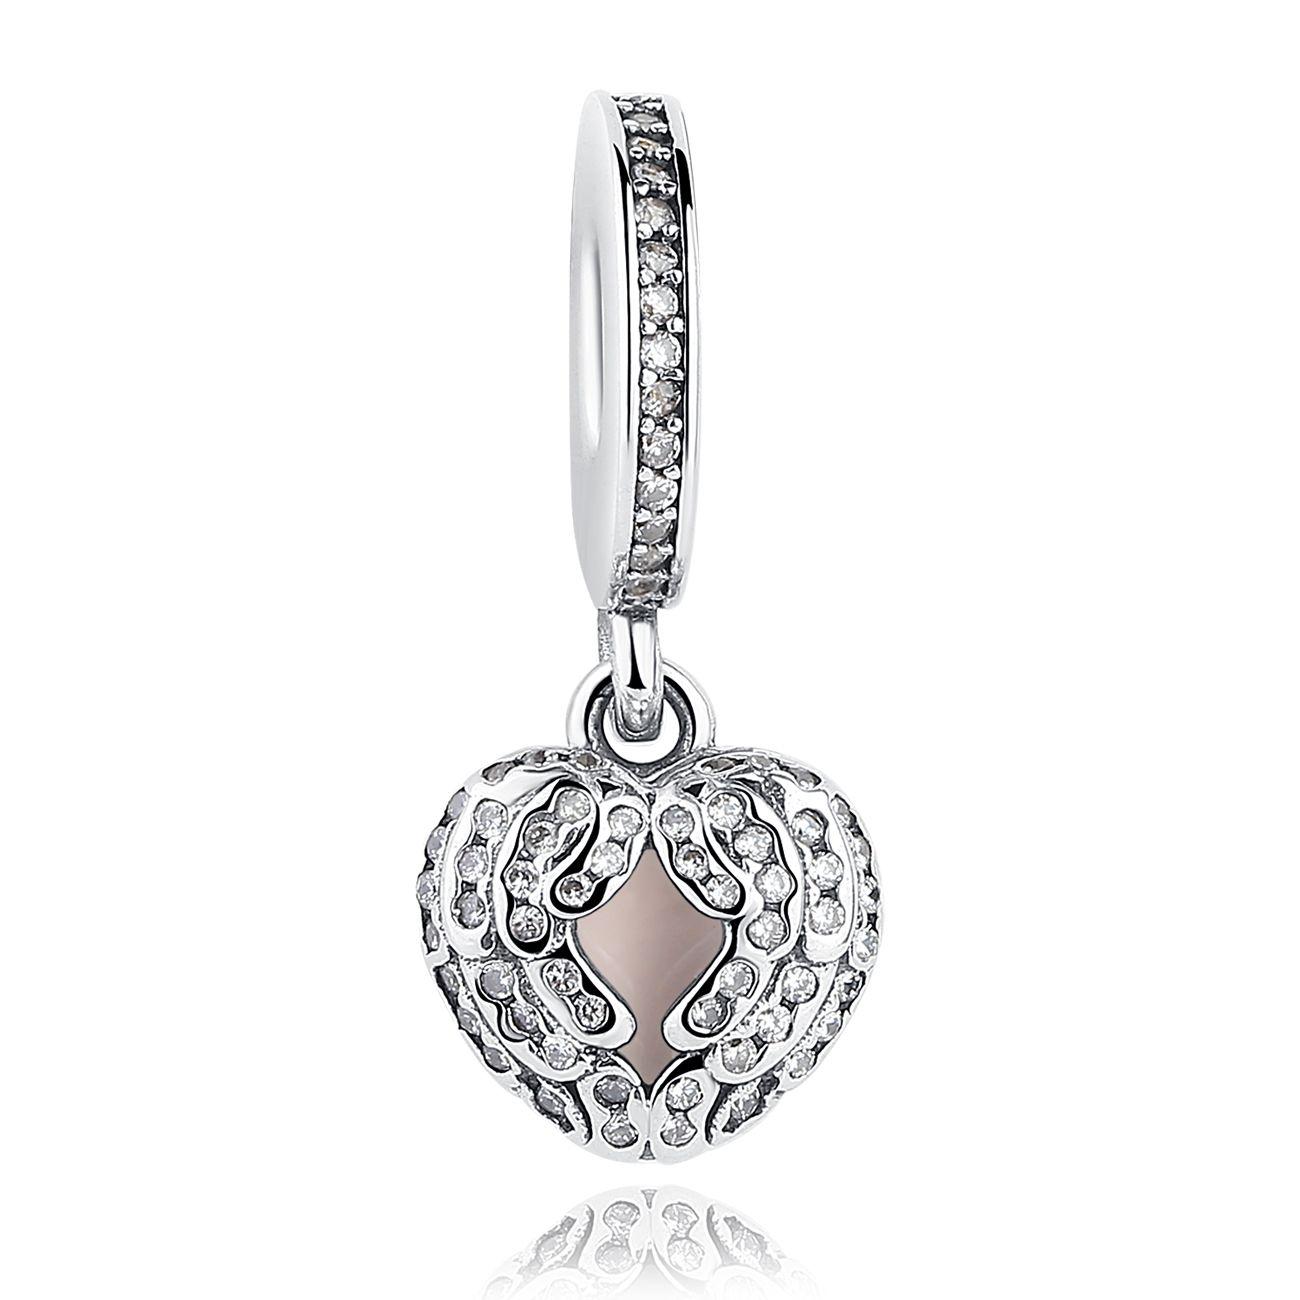 Bamoer Femmes Charme Européen S925 Sterling Silver Bead avec texture Fit Bracelet